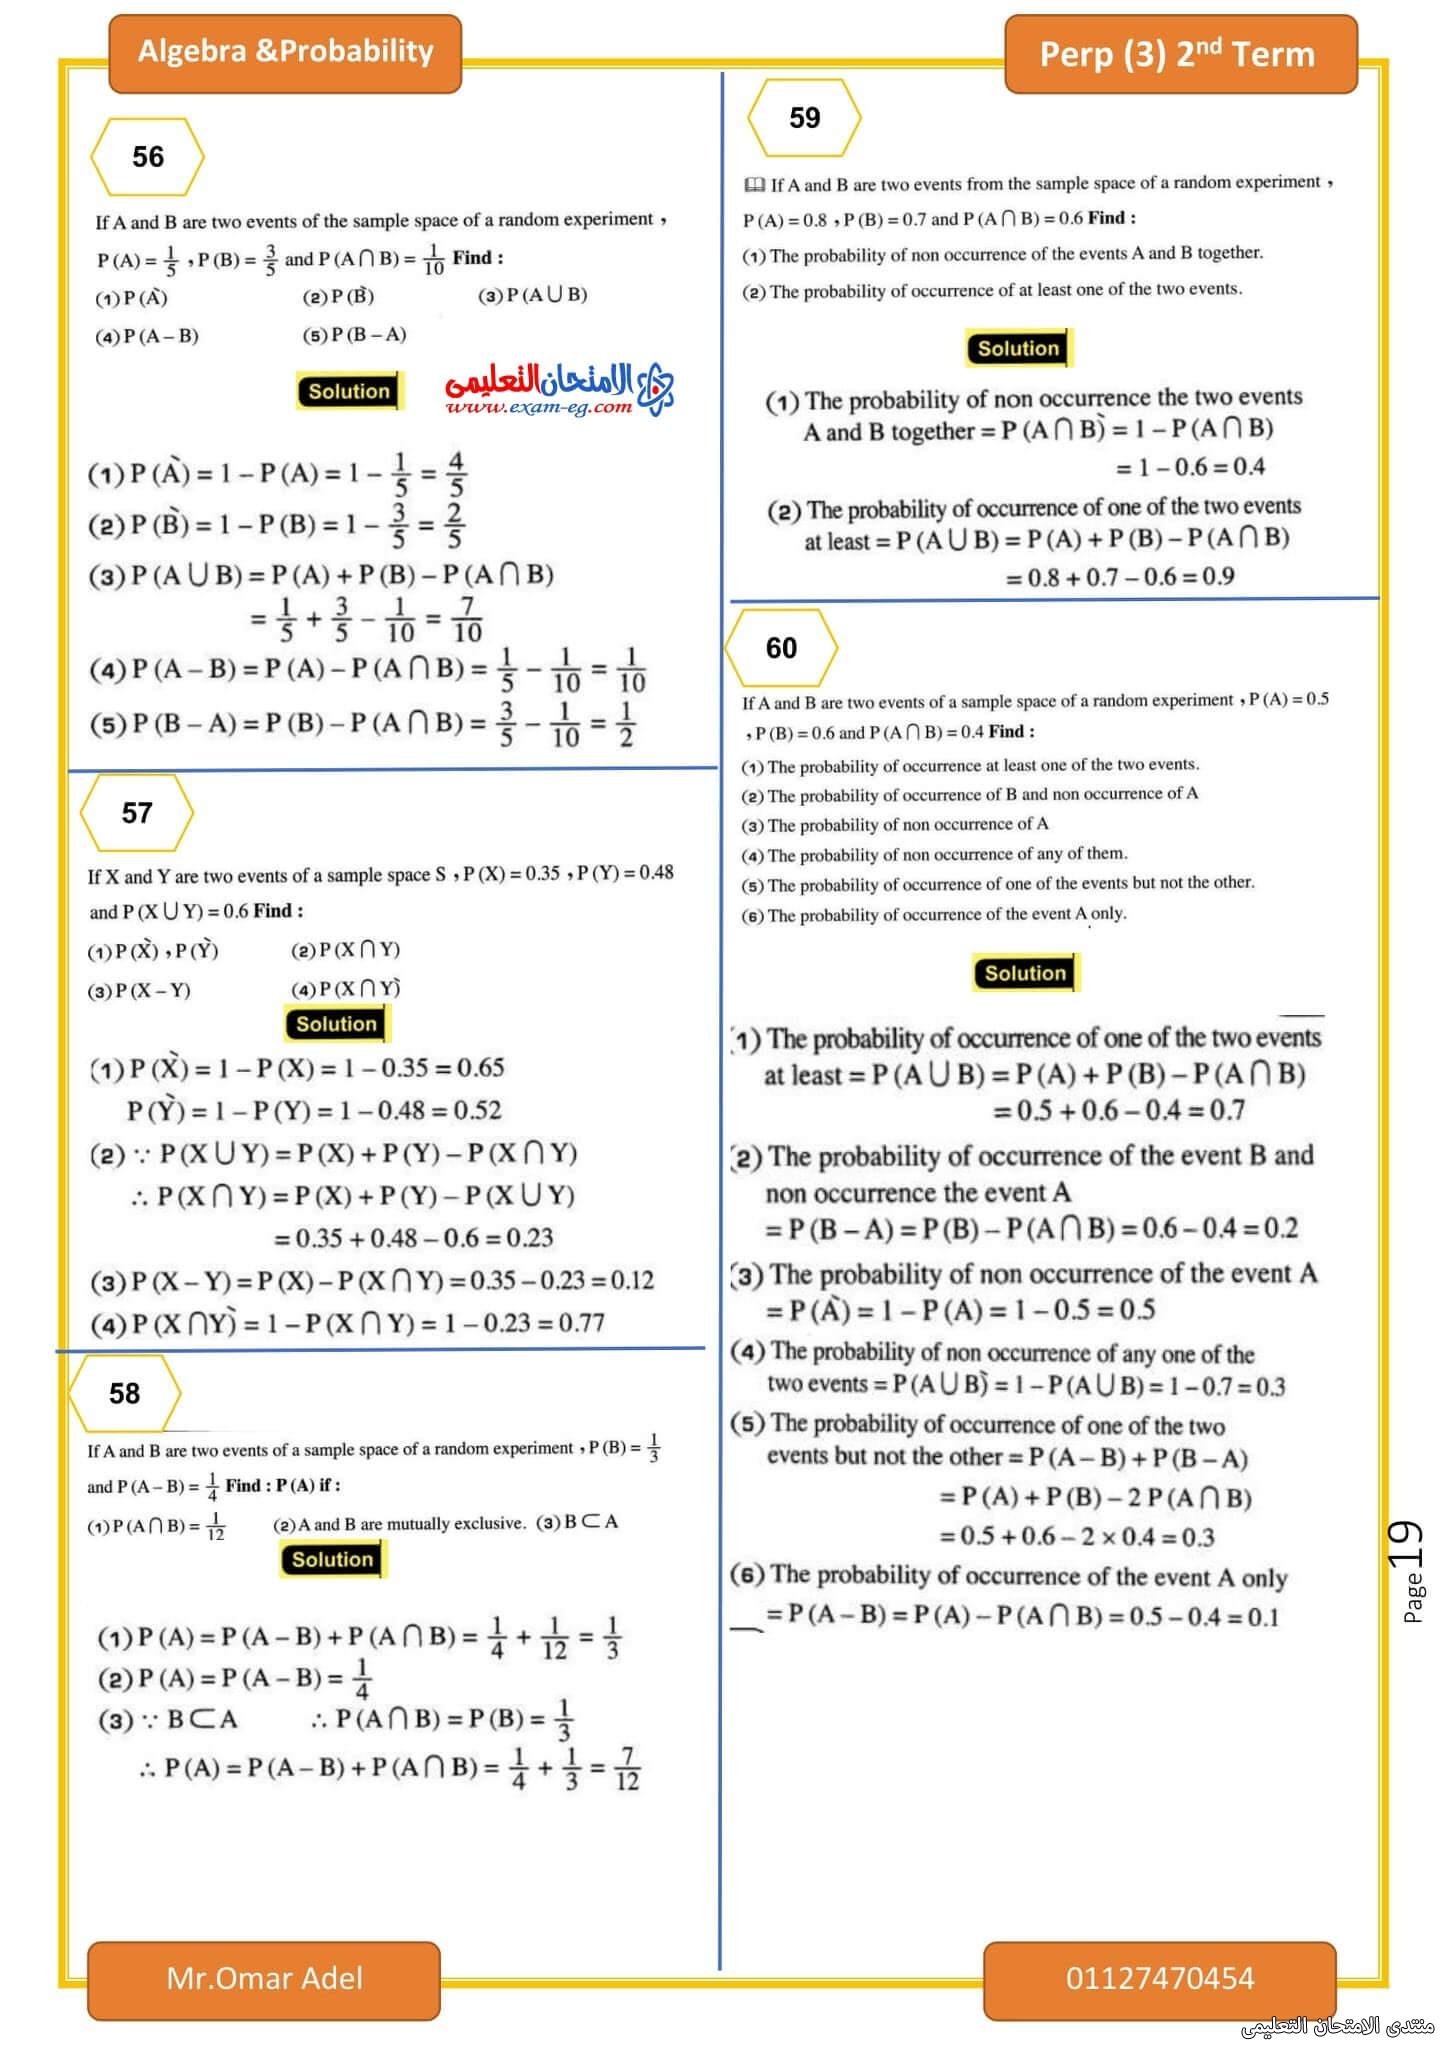 exam-eg.com_1621150393724919.jpg